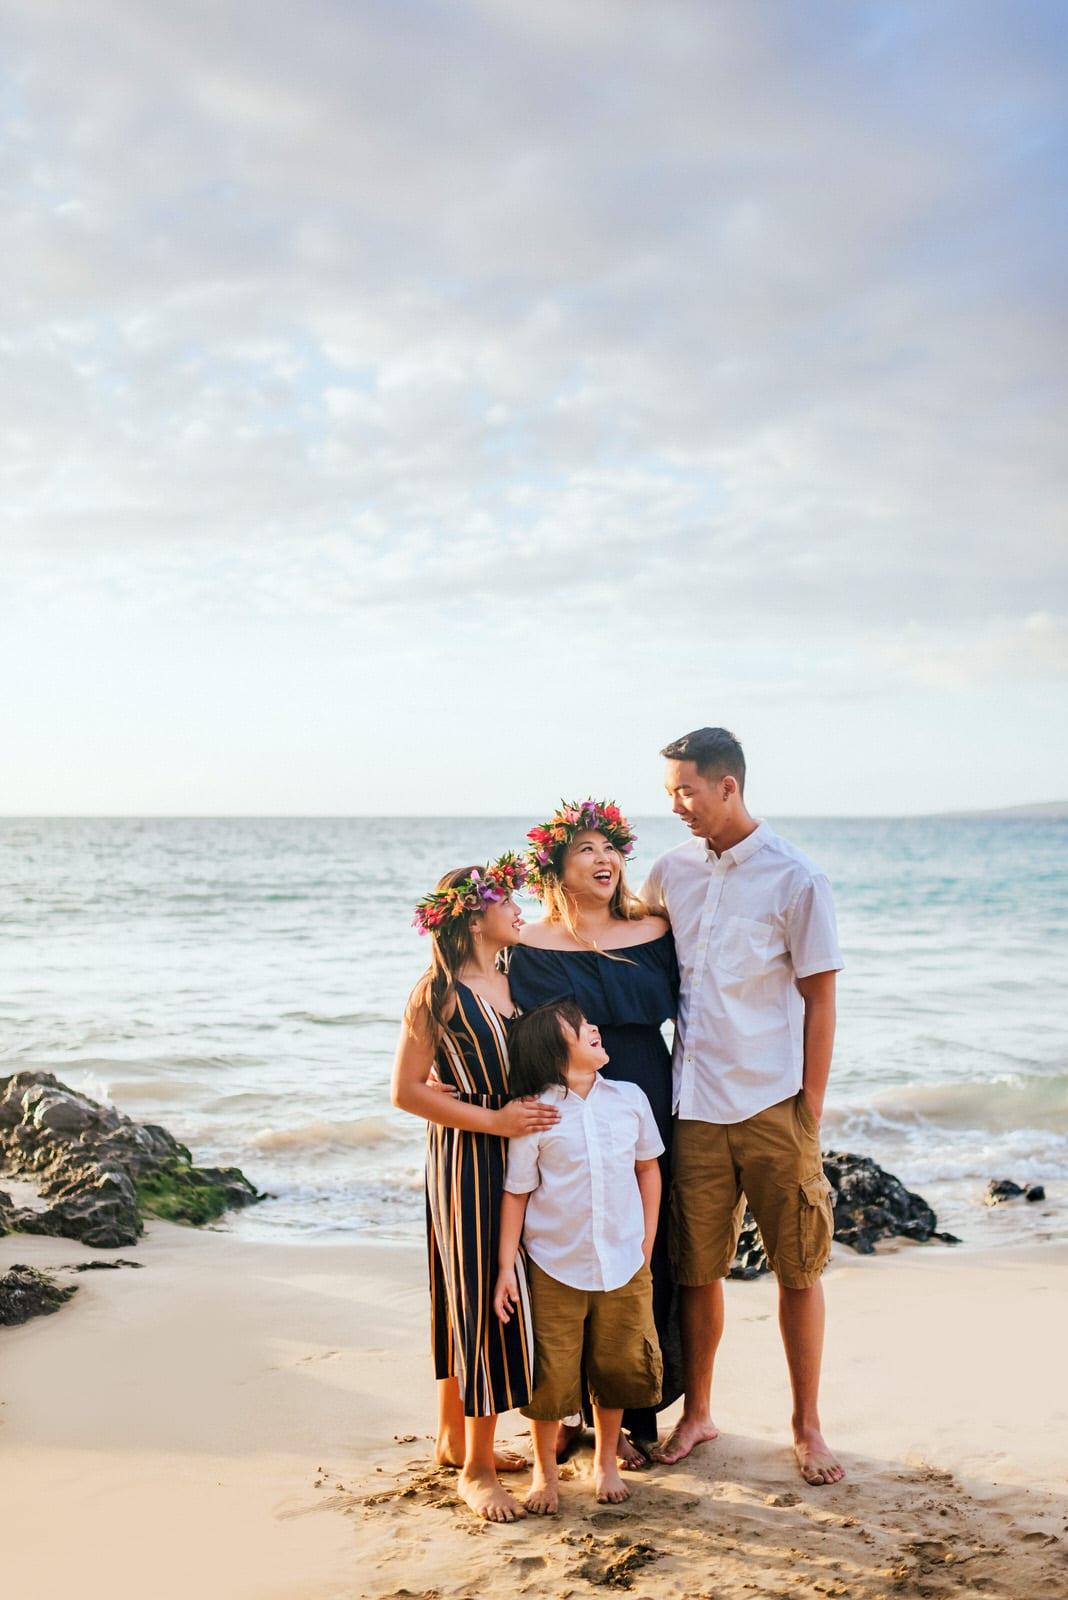 Family-Pictures-Hawaii-Mauna-Kea-Beach-10.jpg